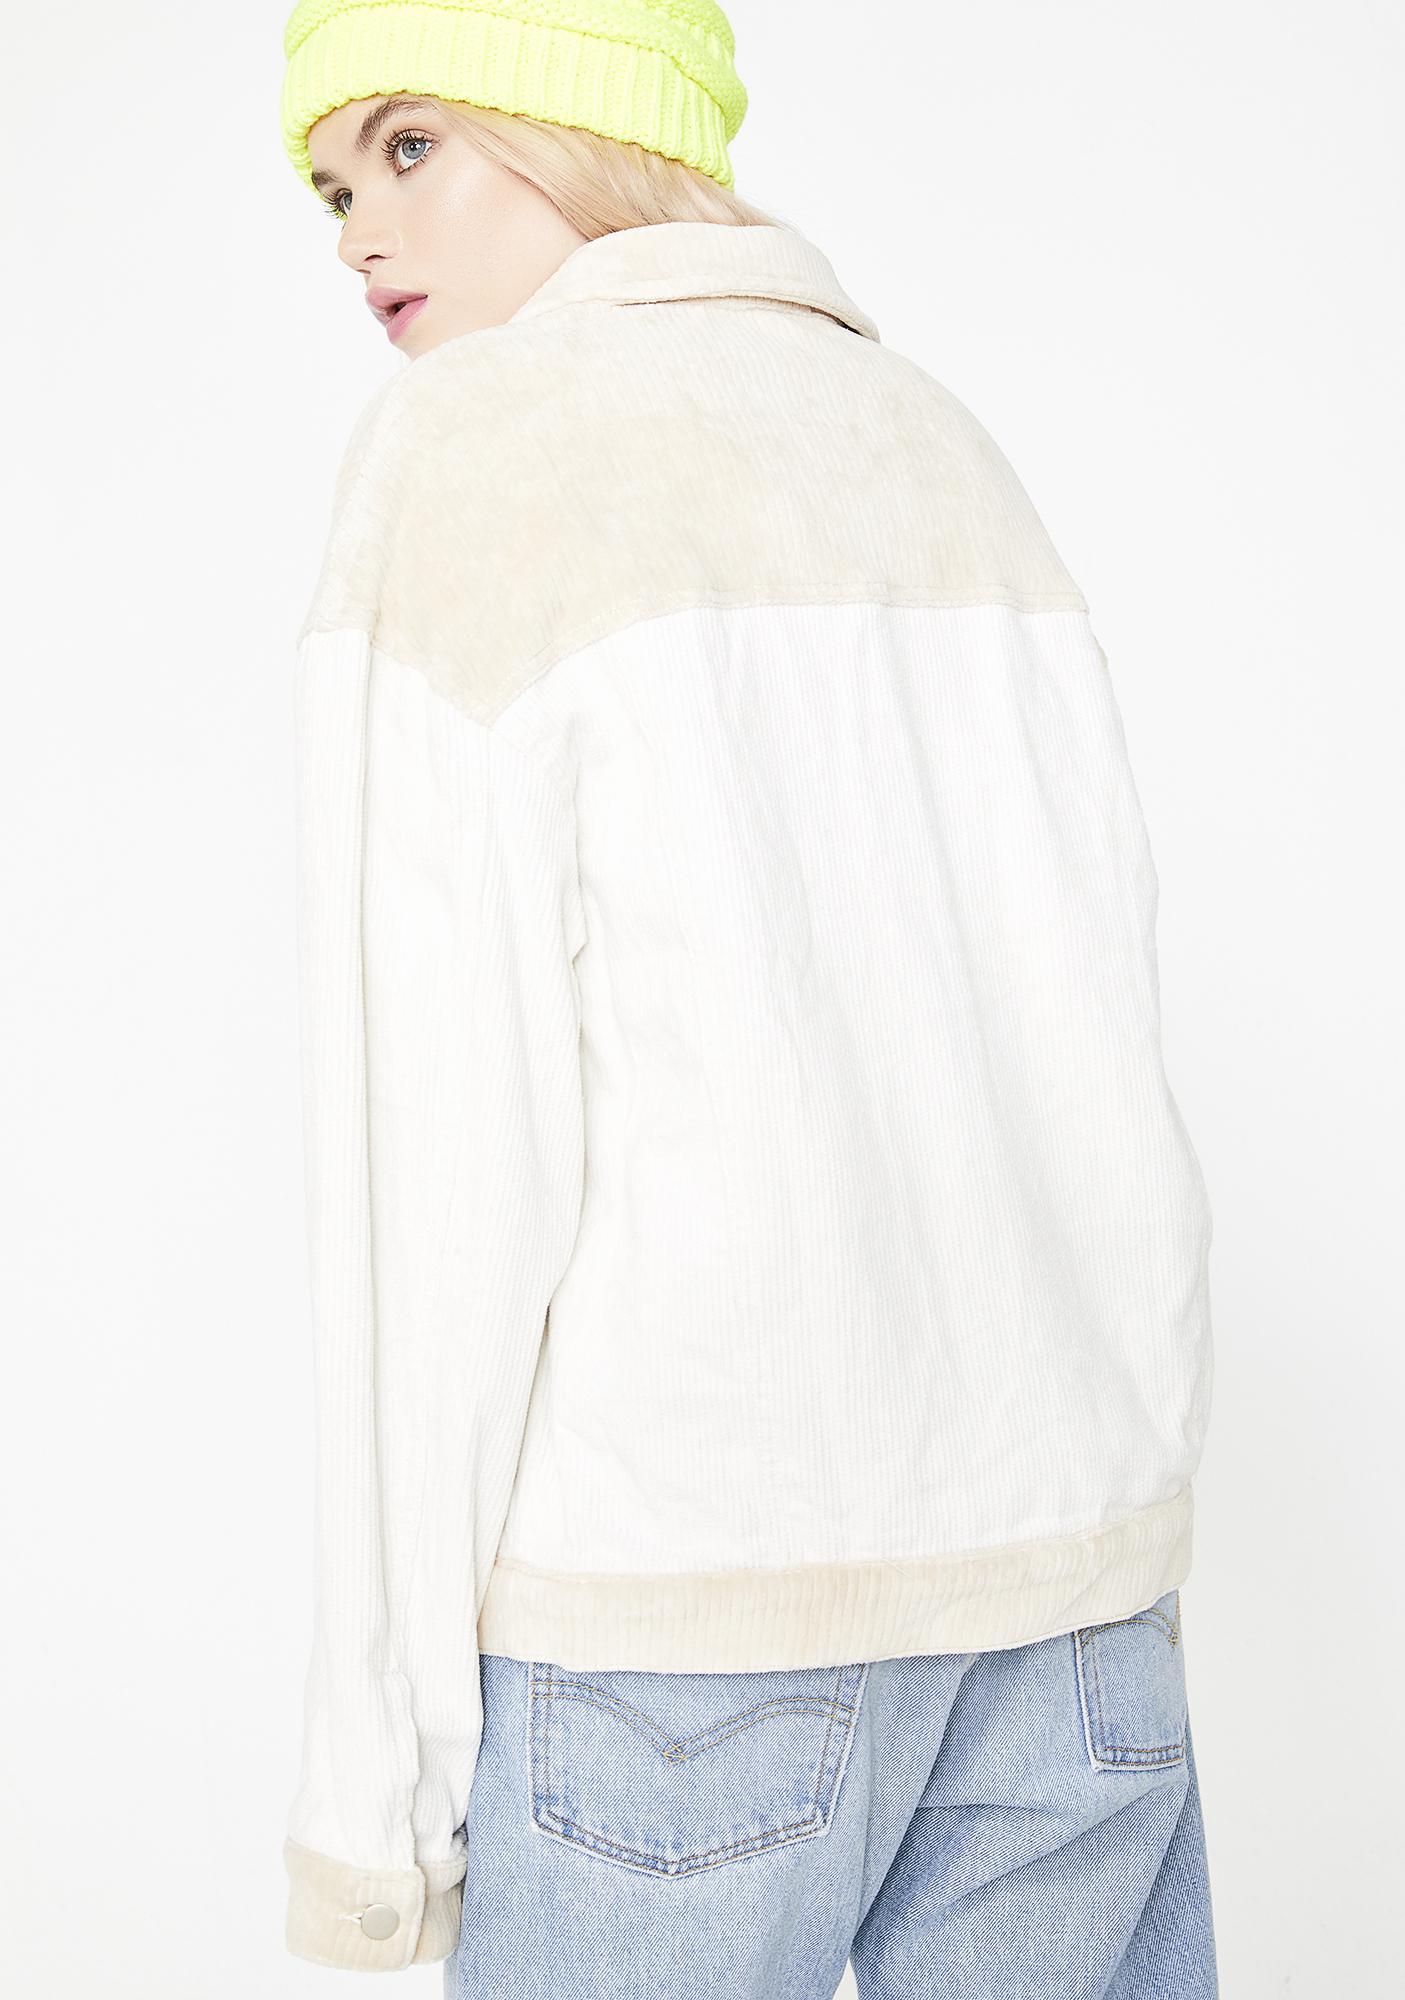 Natural Born Lova Corduroy Jacket